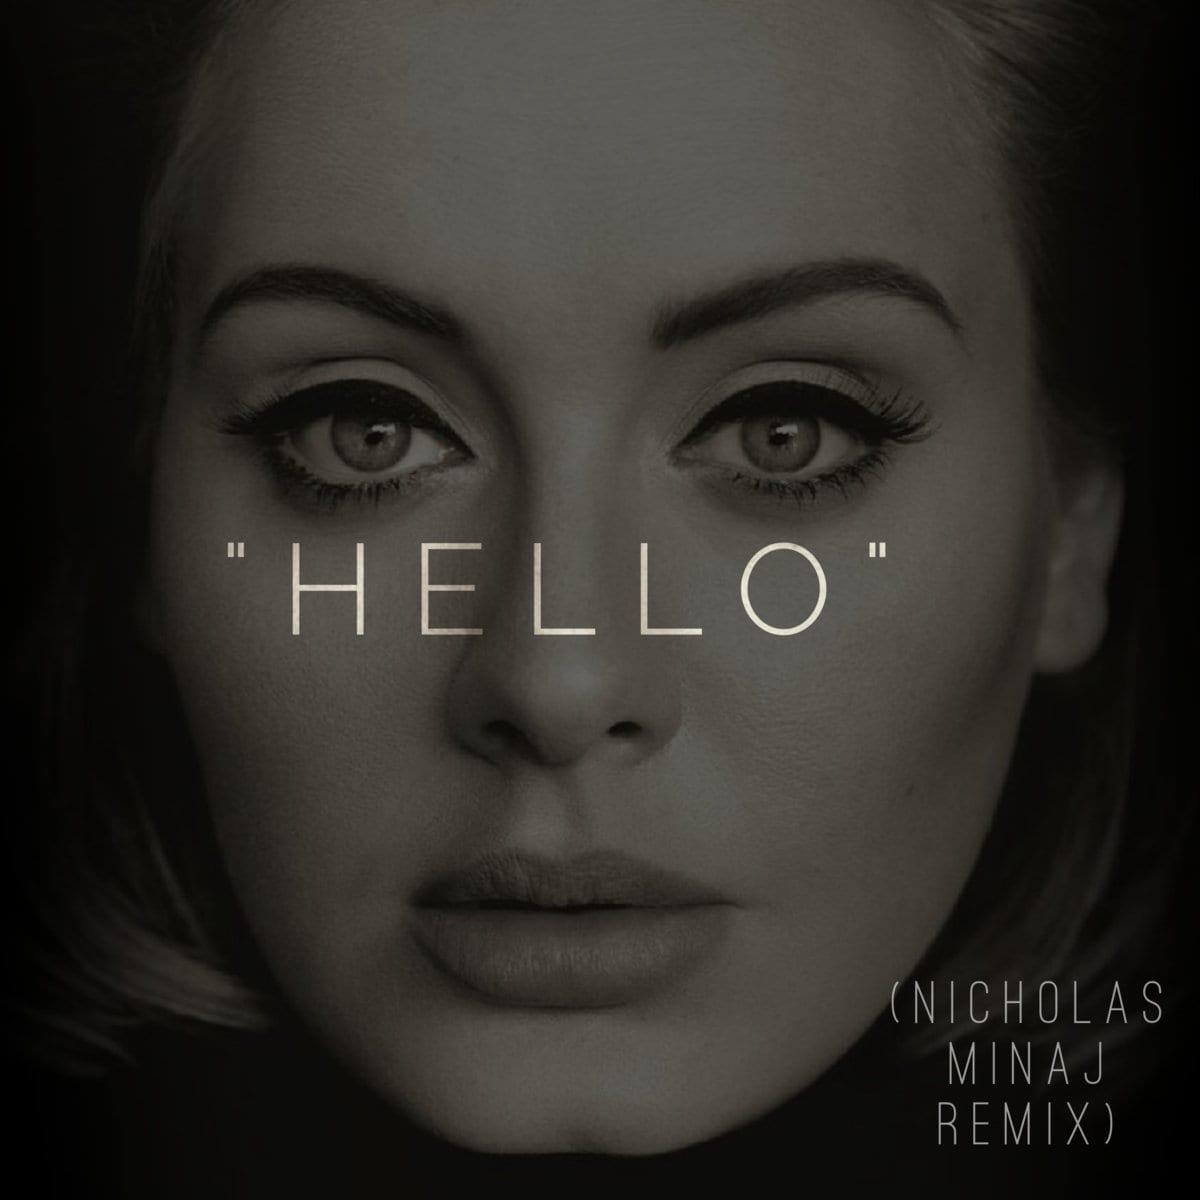 Adele,Credit card